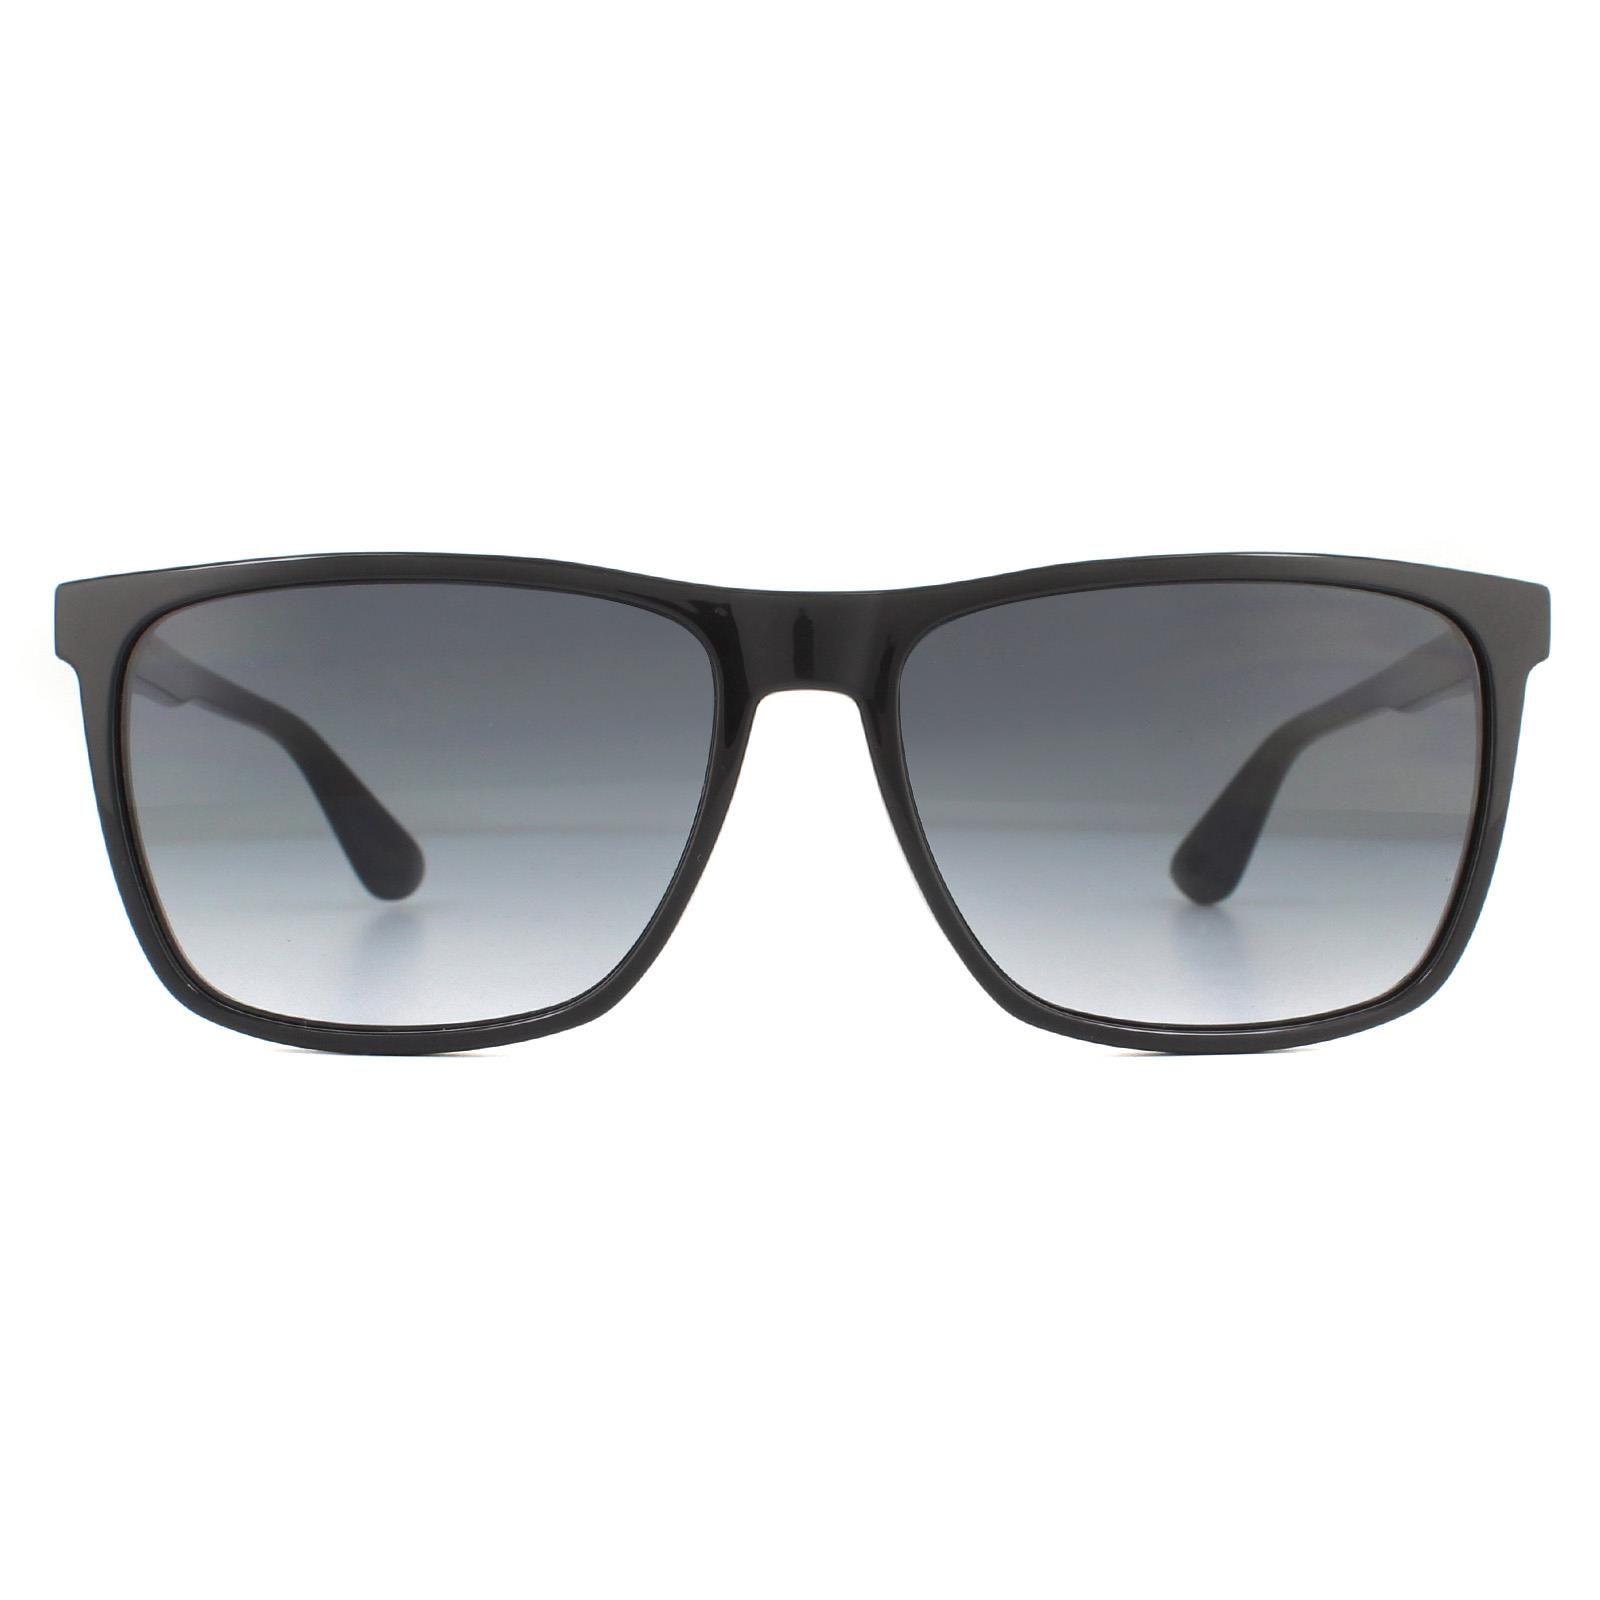 Tommy Hilfiger Sunglasses TH 1547/S 807 9O Black Dark Grey Gradient